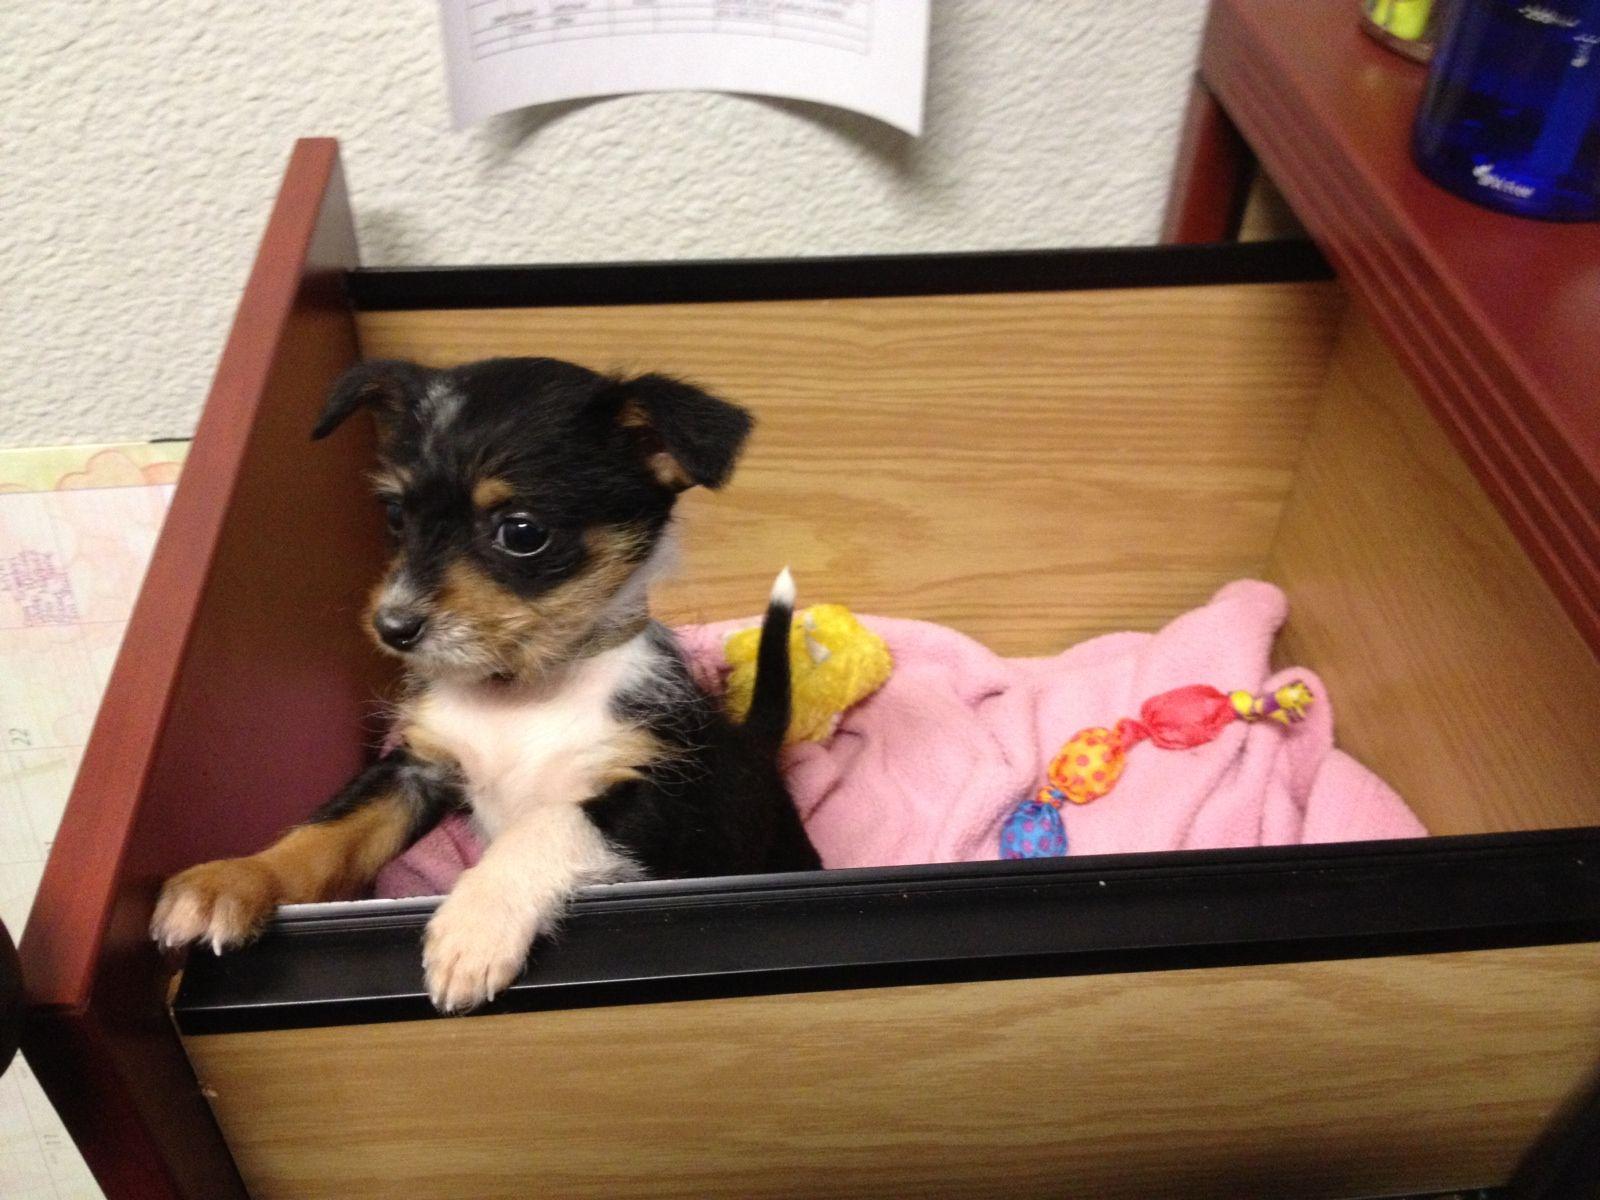 Puppy Up For Adoption At Petsmart Animals Puppies Petsmart